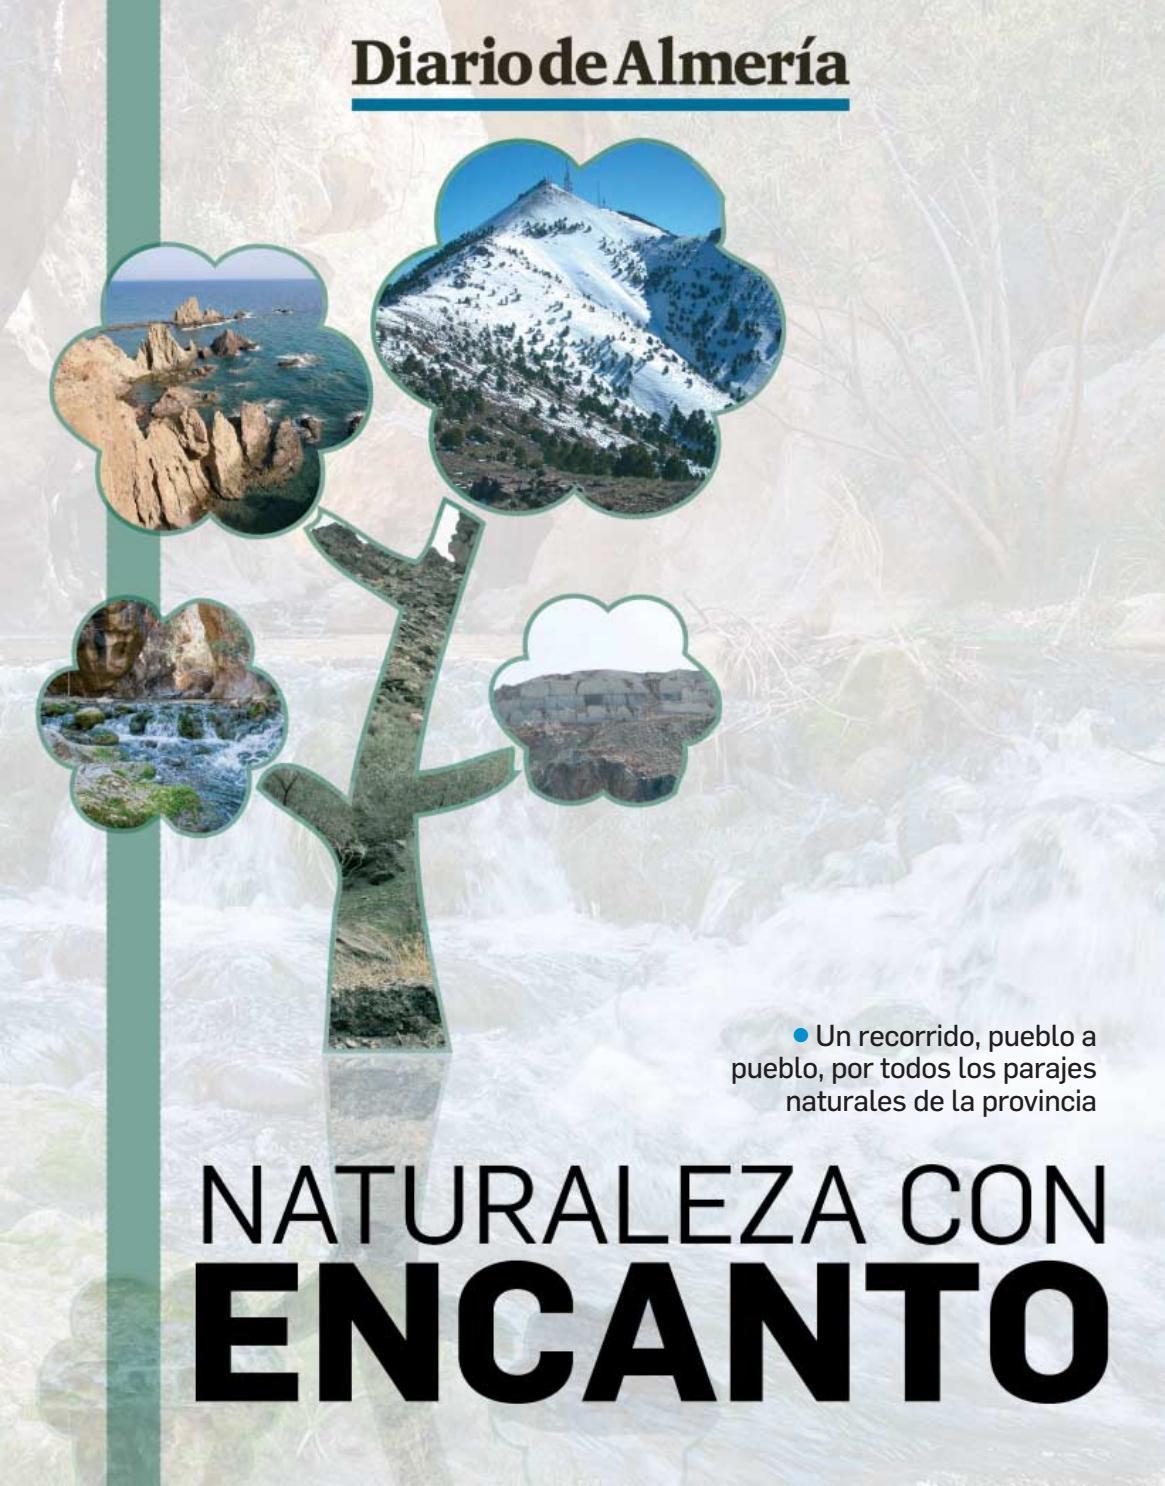 Naturaleza con encanto by Joly_Digital - issuu